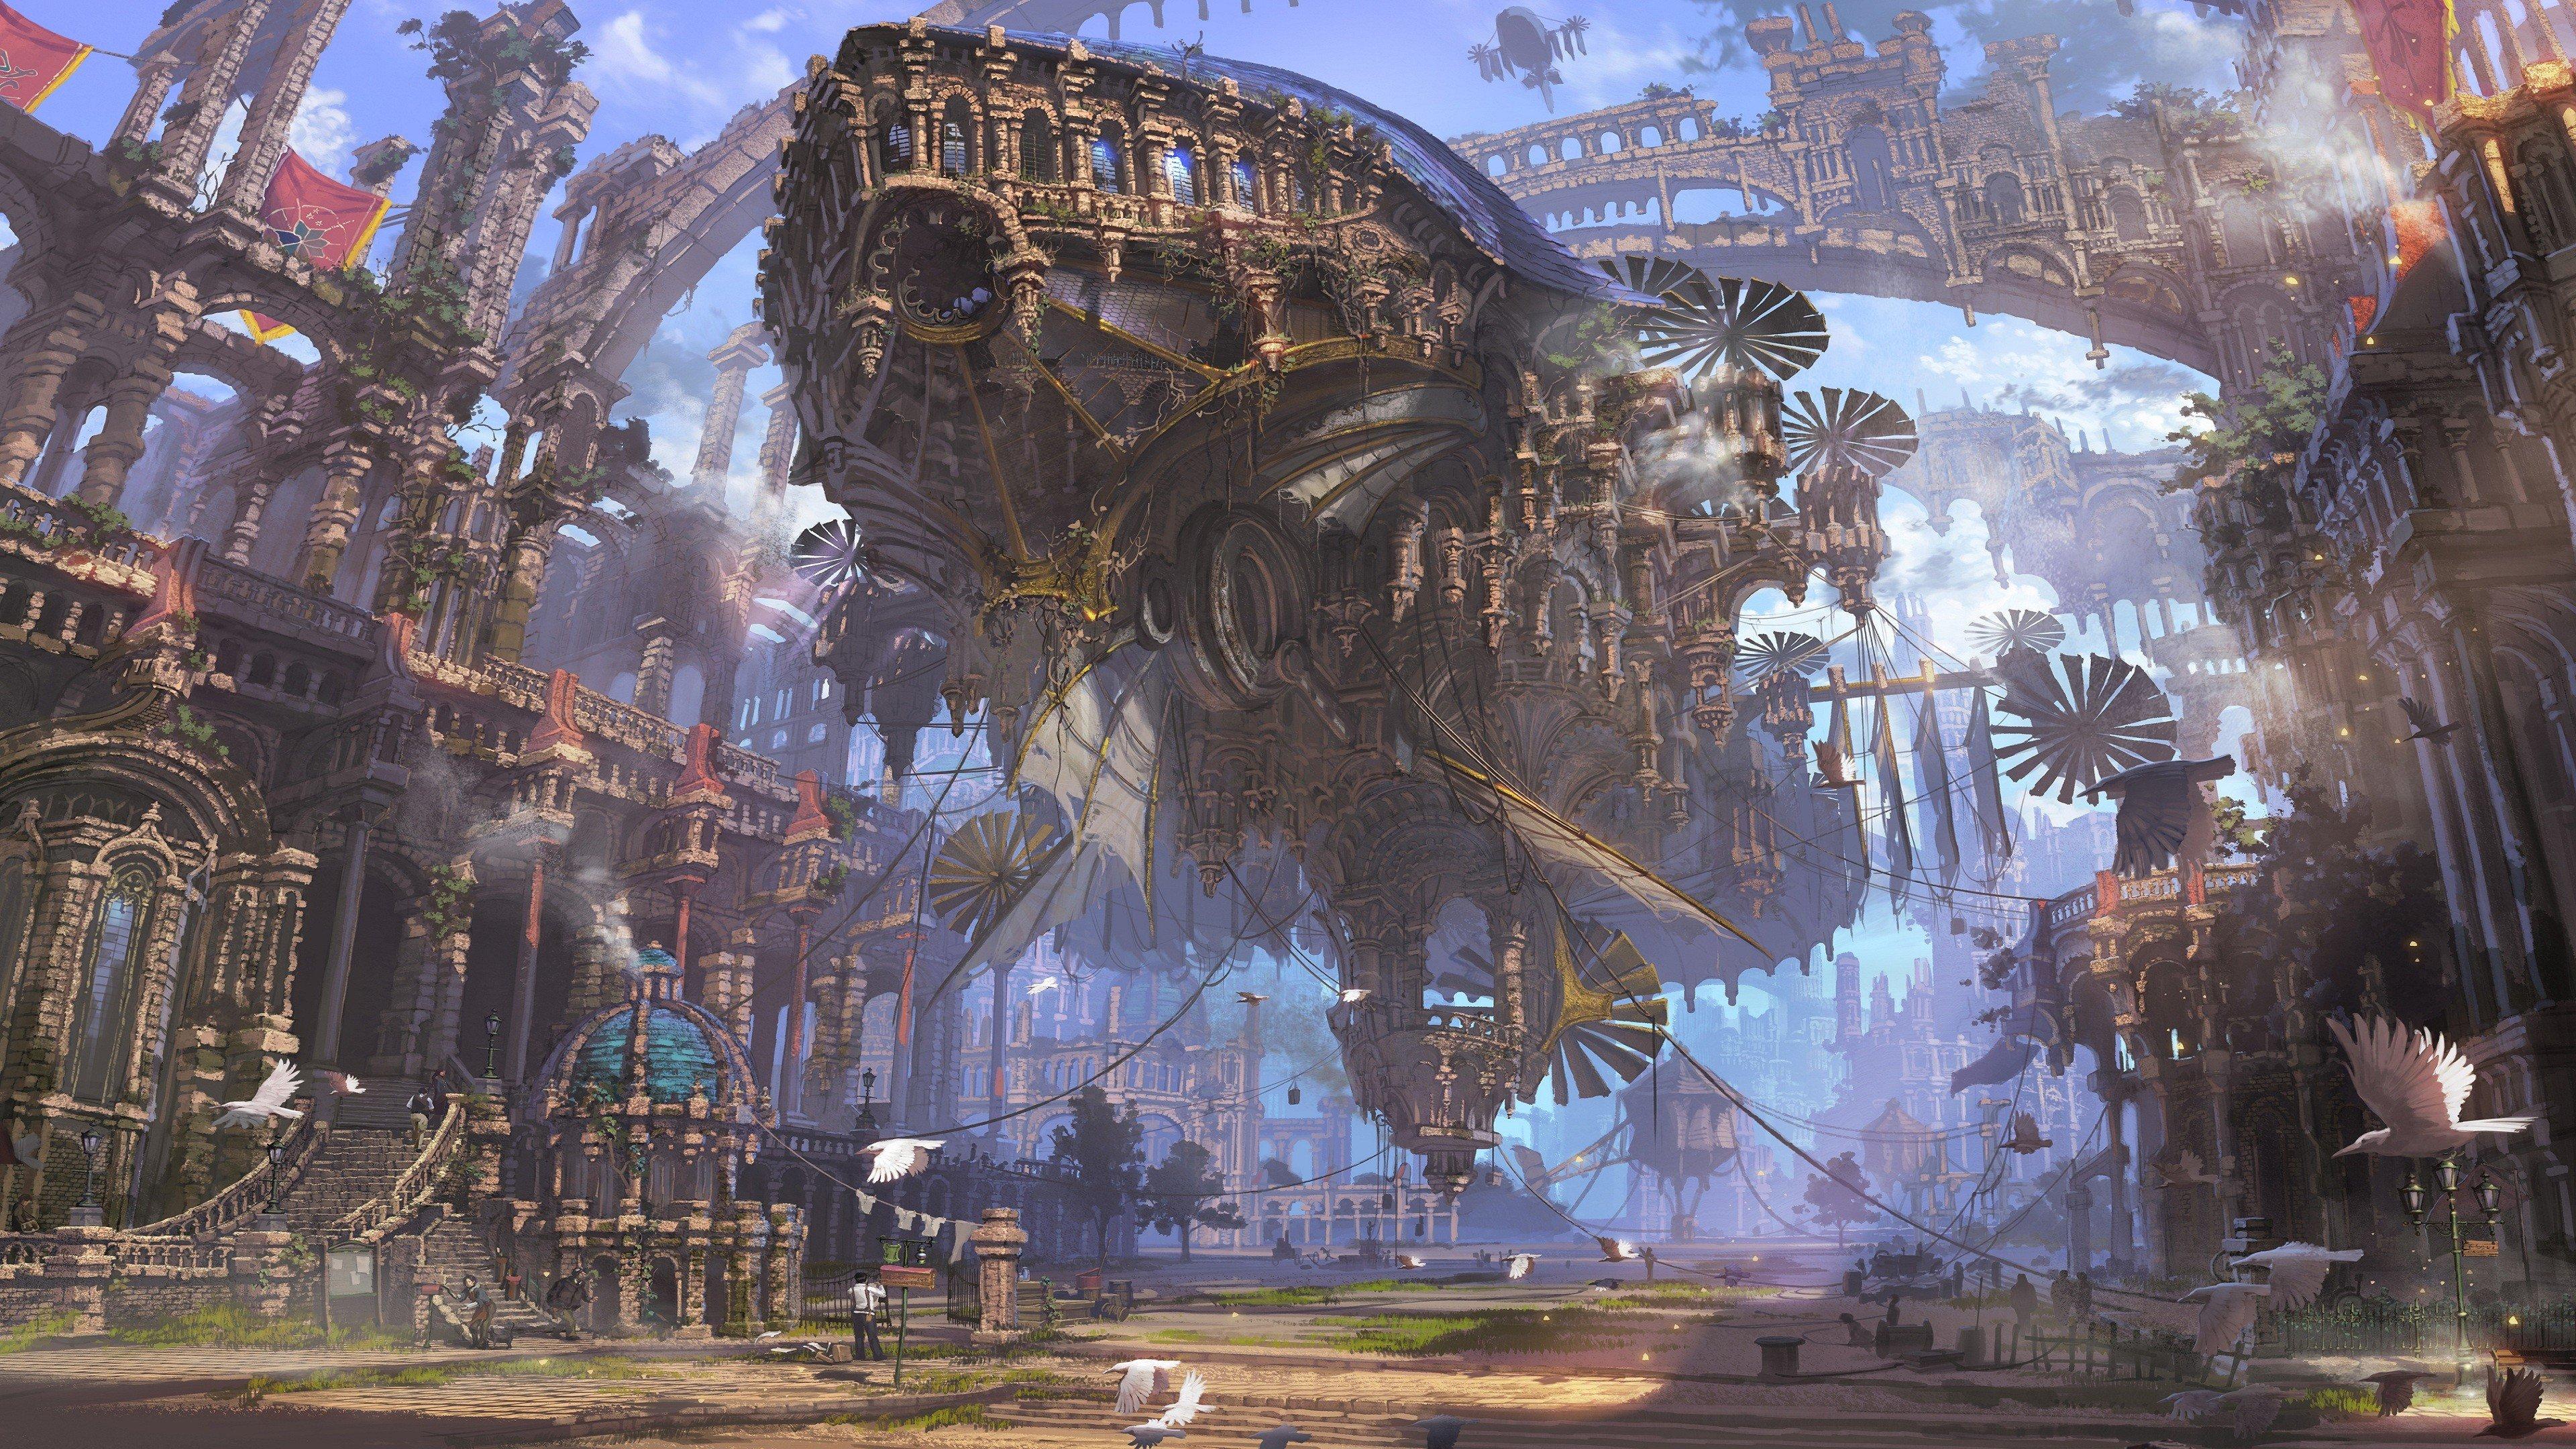 Bioshock Bioshock Infinite Statue steampunk cities wallpaper ...